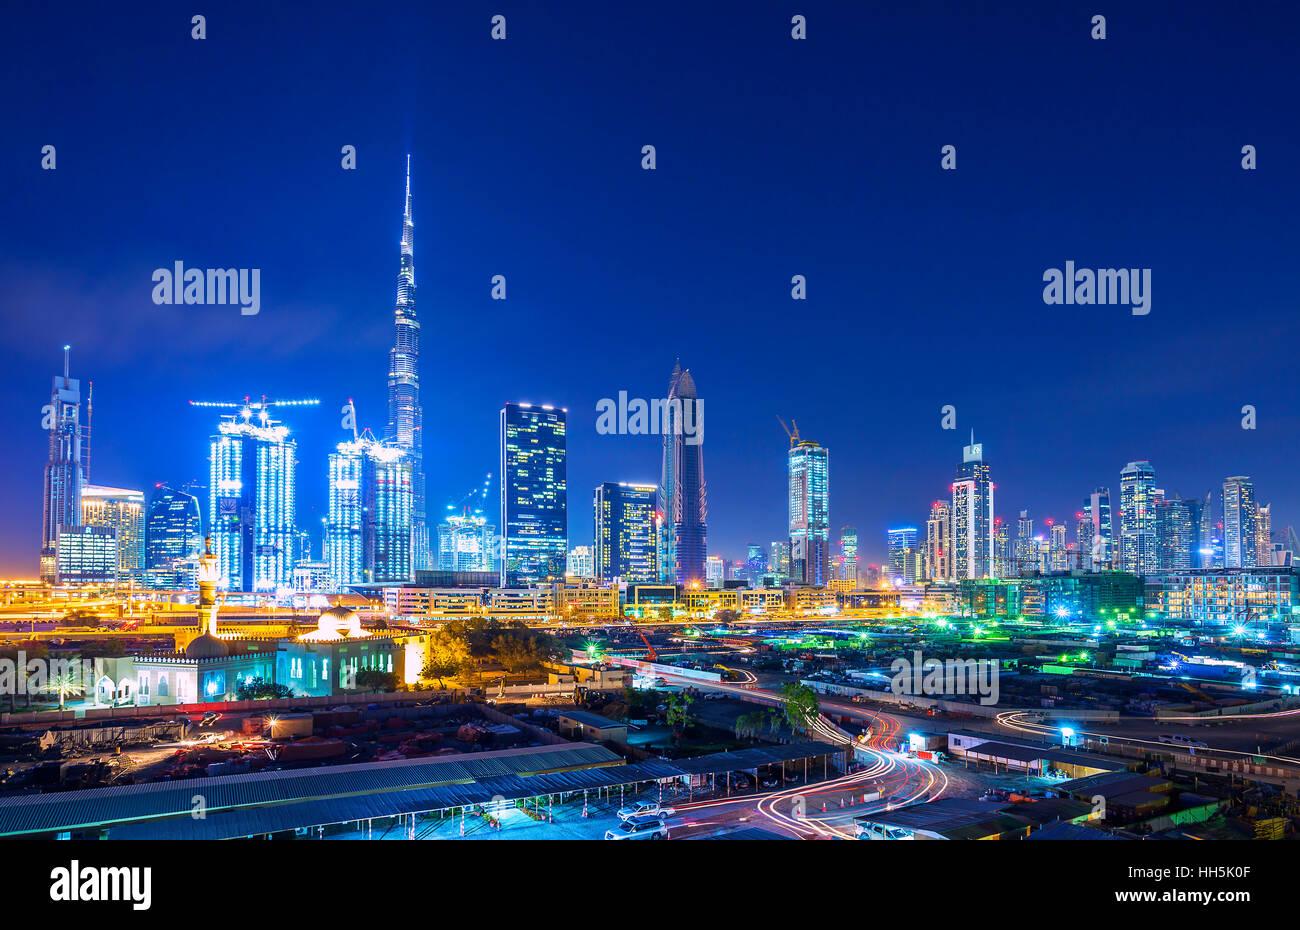 DUBAI FINANCIAL CENTER,UNITED ARAB EMIRATES-FEBRUARY 28, 2016: View on skyline of Dubai Financial Center with modern - Stock Image